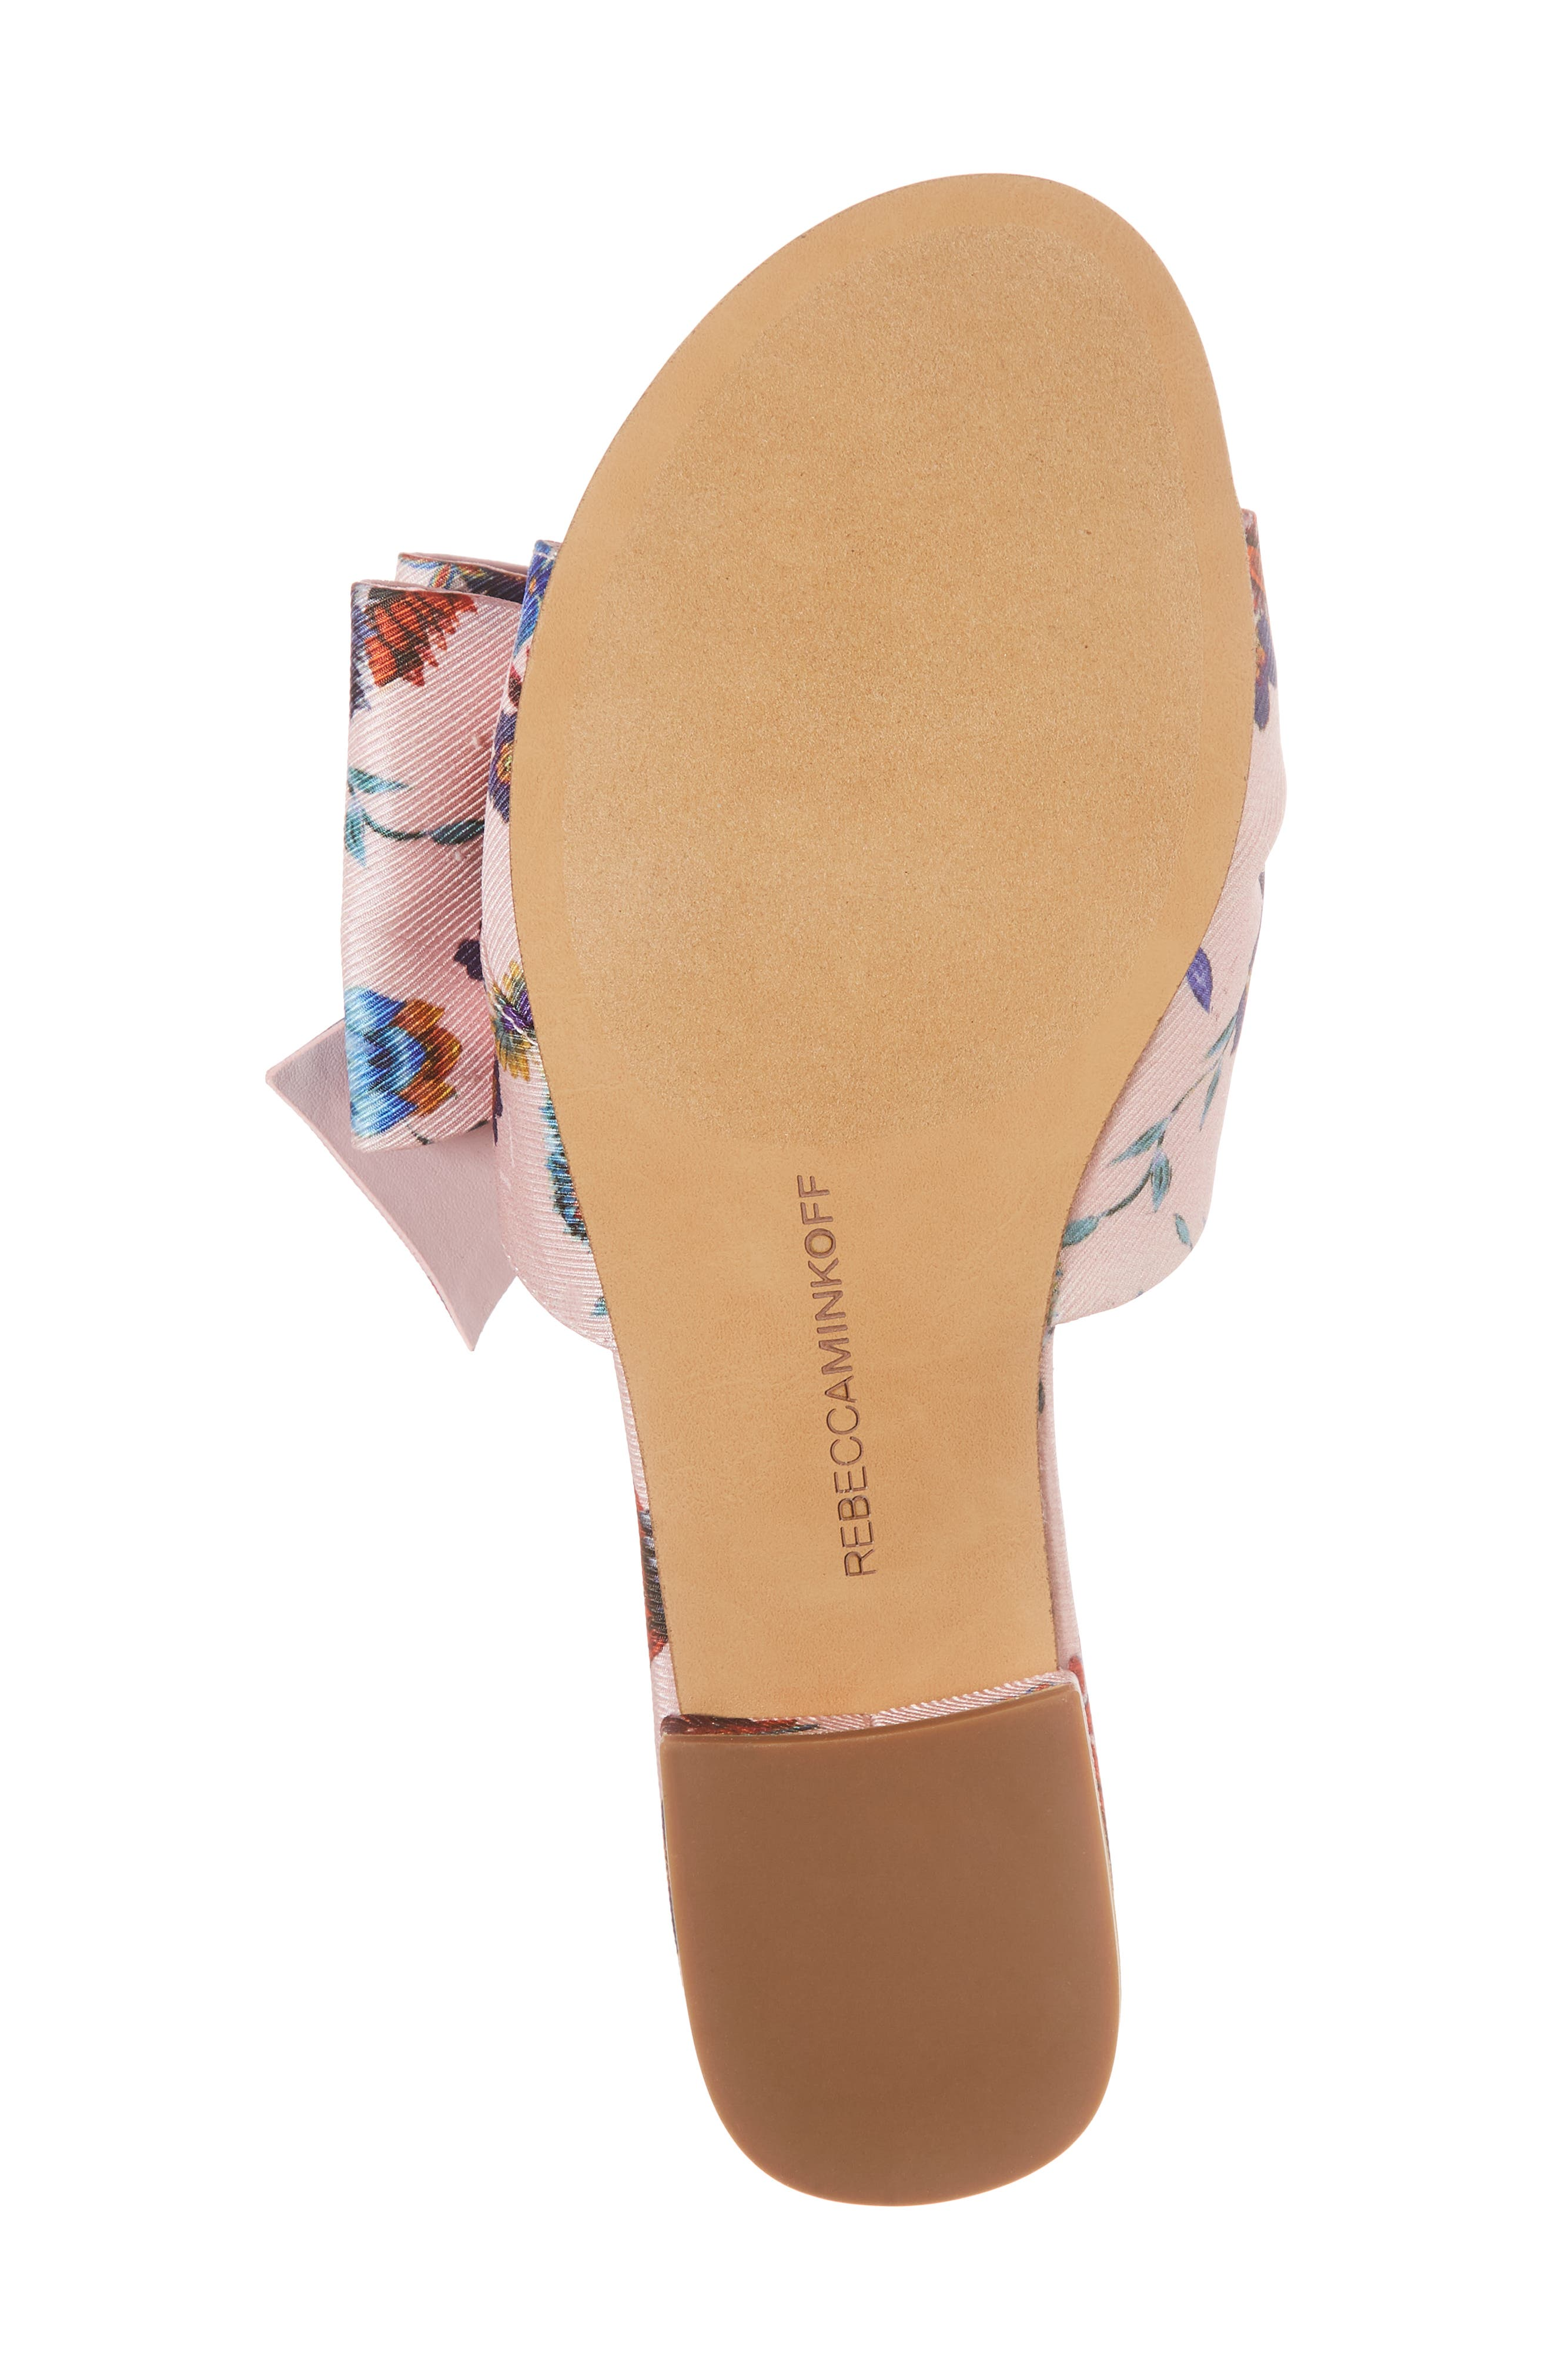 Calista Slide Sandal,                             Alternate thumbnail 6, color,                             Millennial Pink Multi Fabric